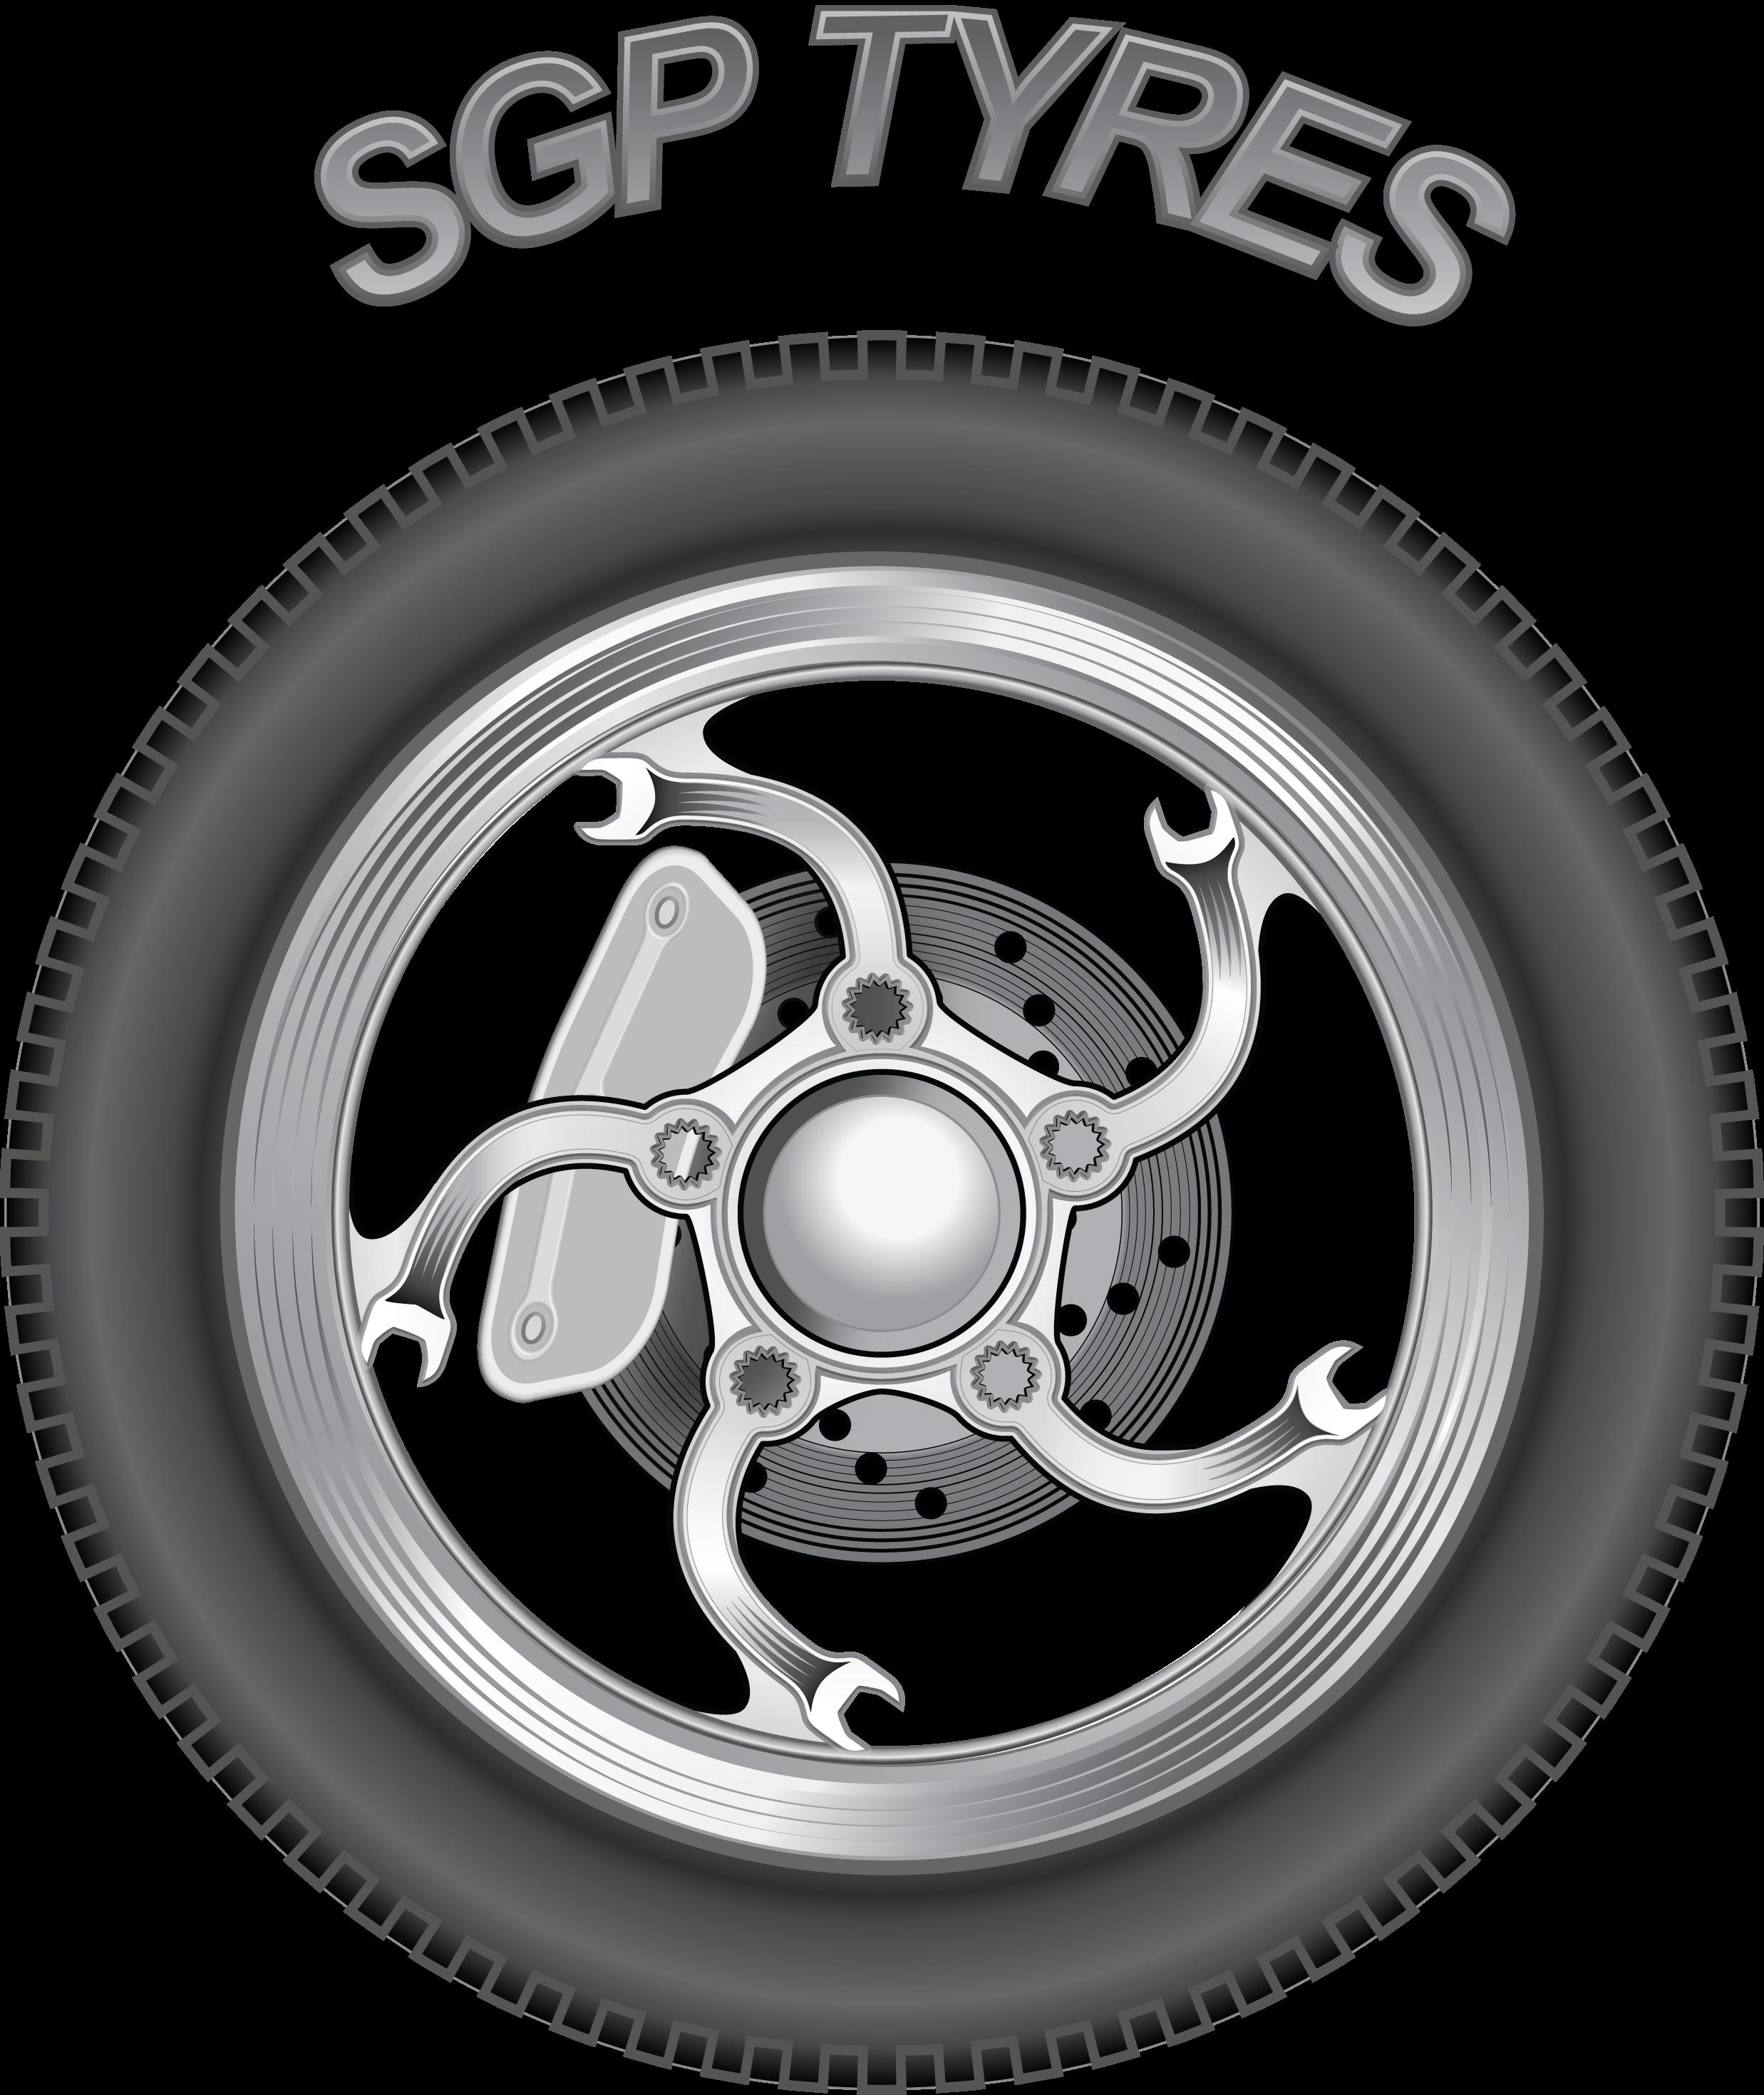 sgp tyres logo